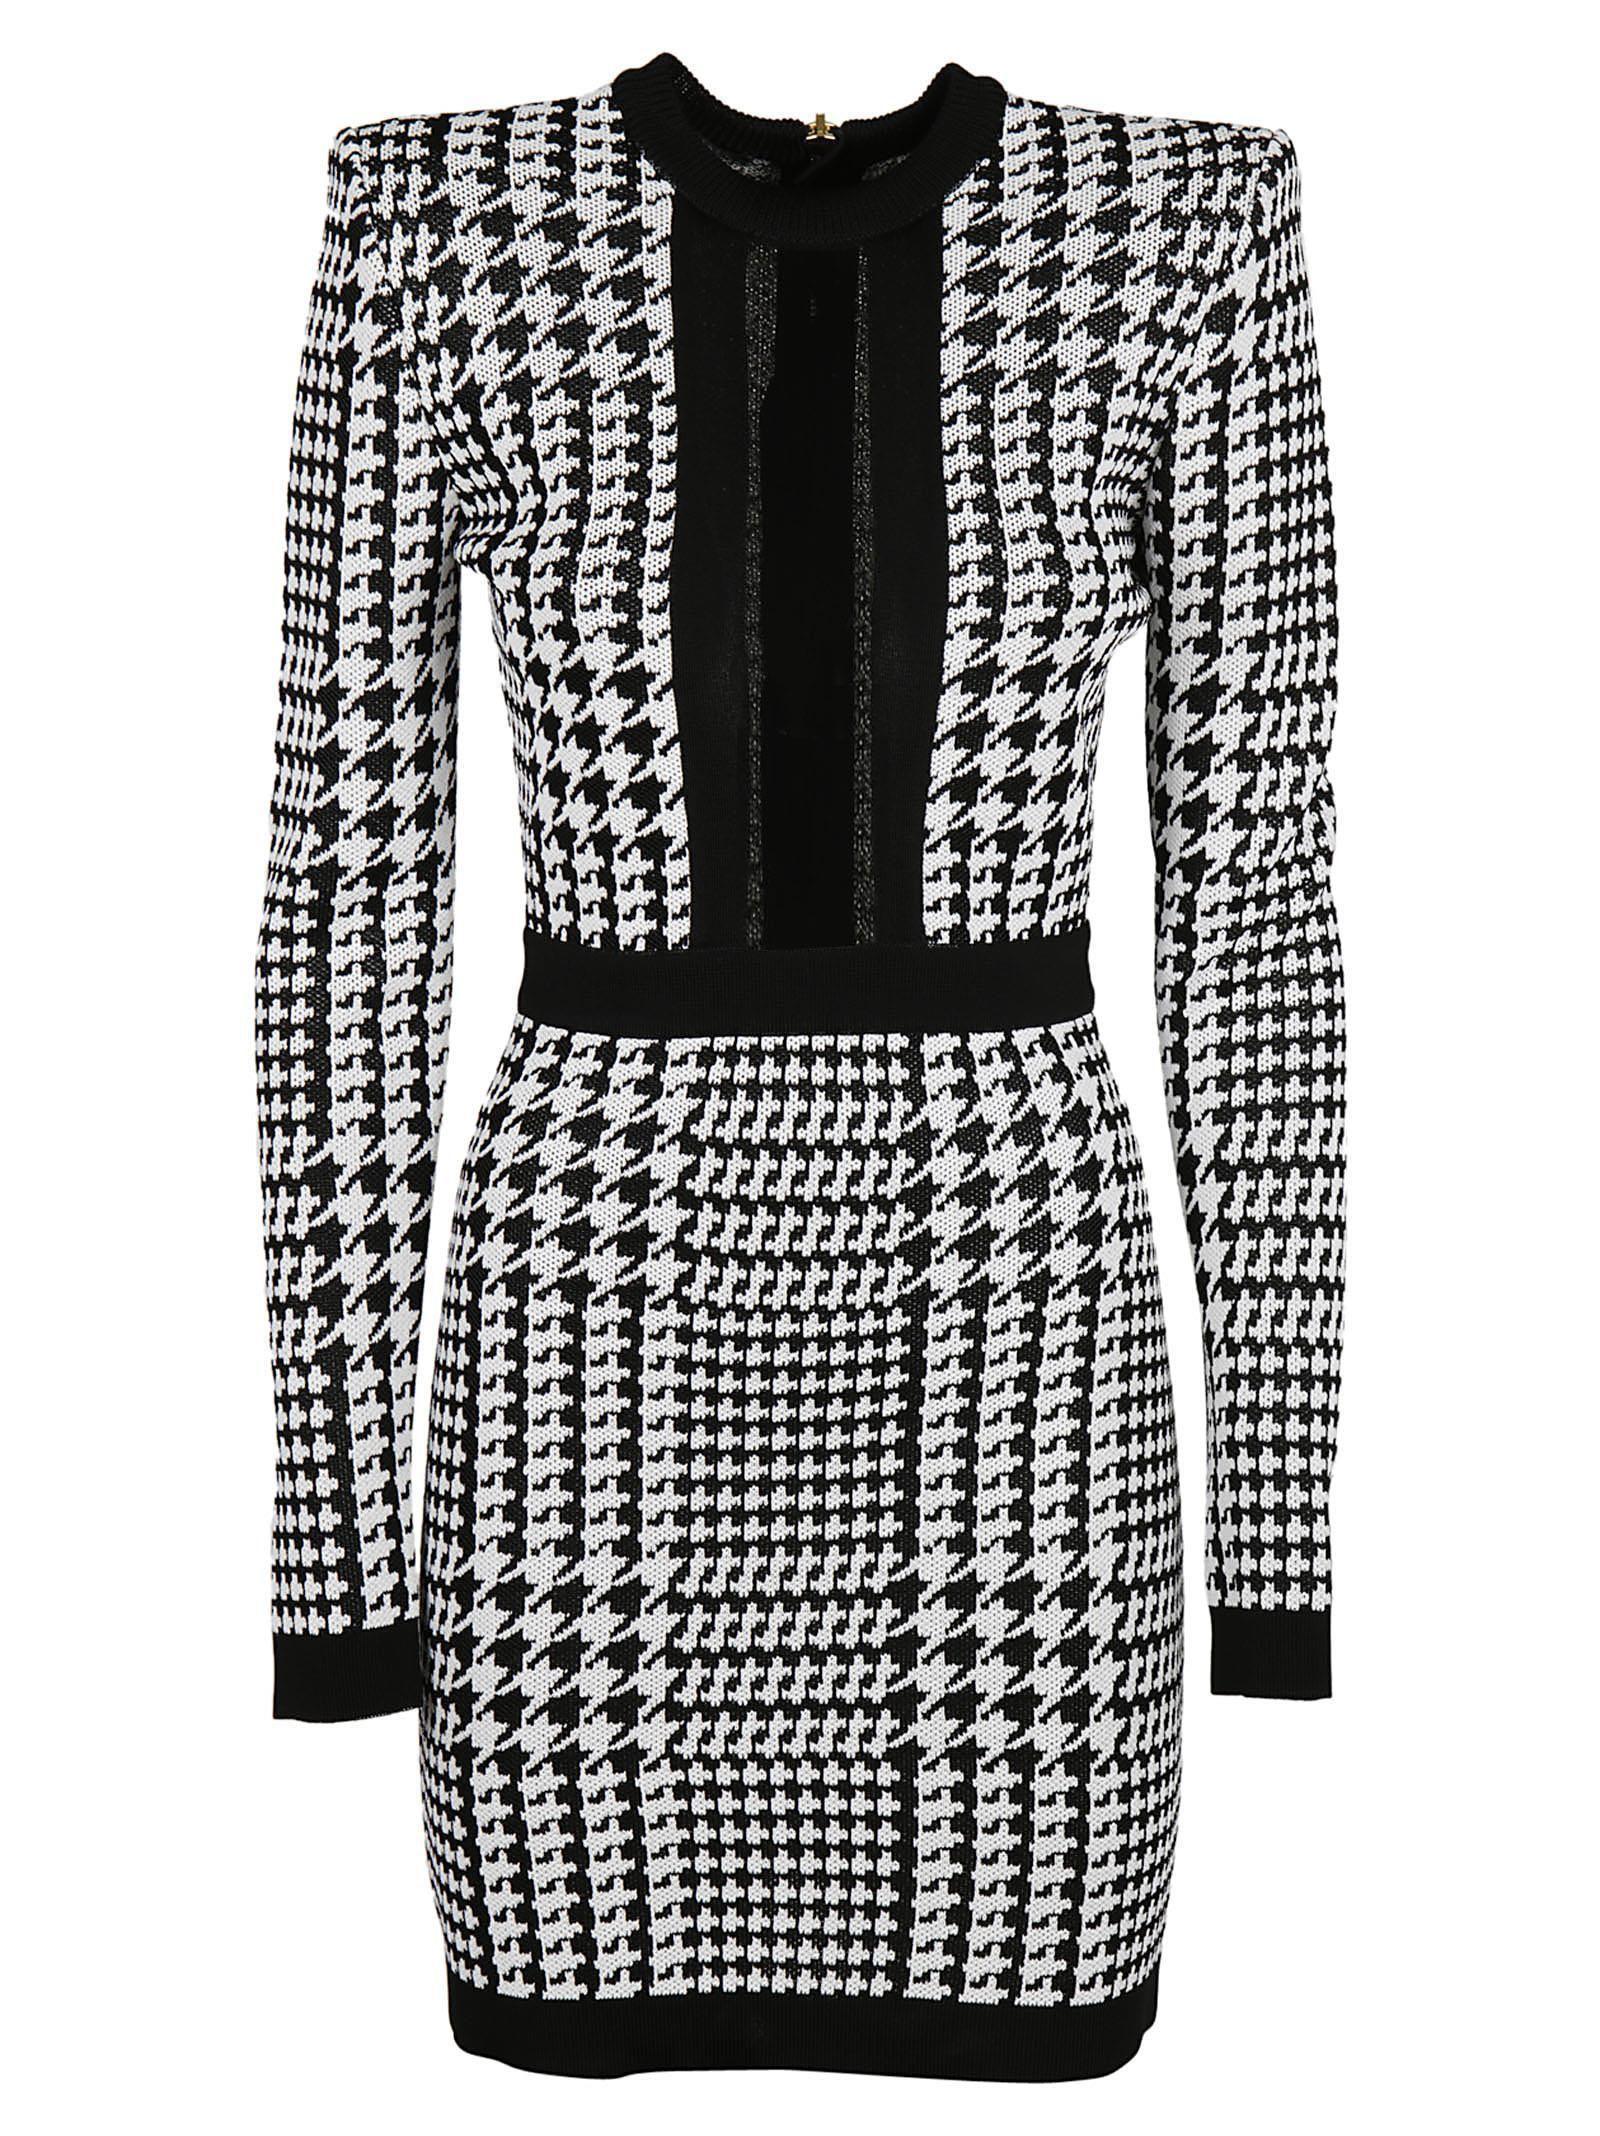 a8171dc9 Balmain Houndstooth Mesh-Trimmed Stretch-Knit Mini Dress In Black ...